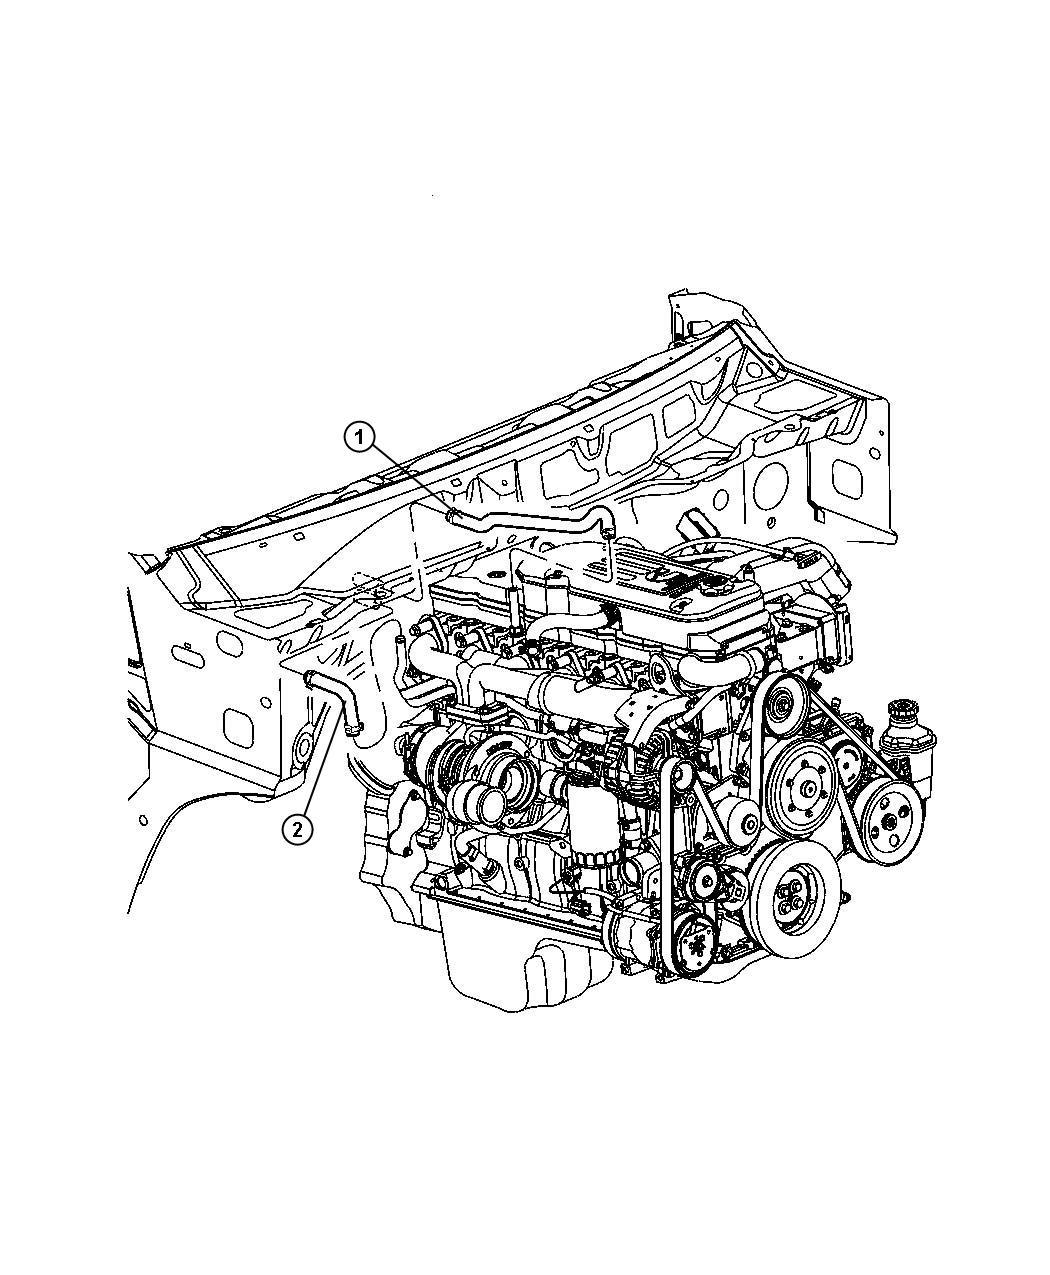 2008 Dodge Ram 2500 Hose. Heater, heater supply